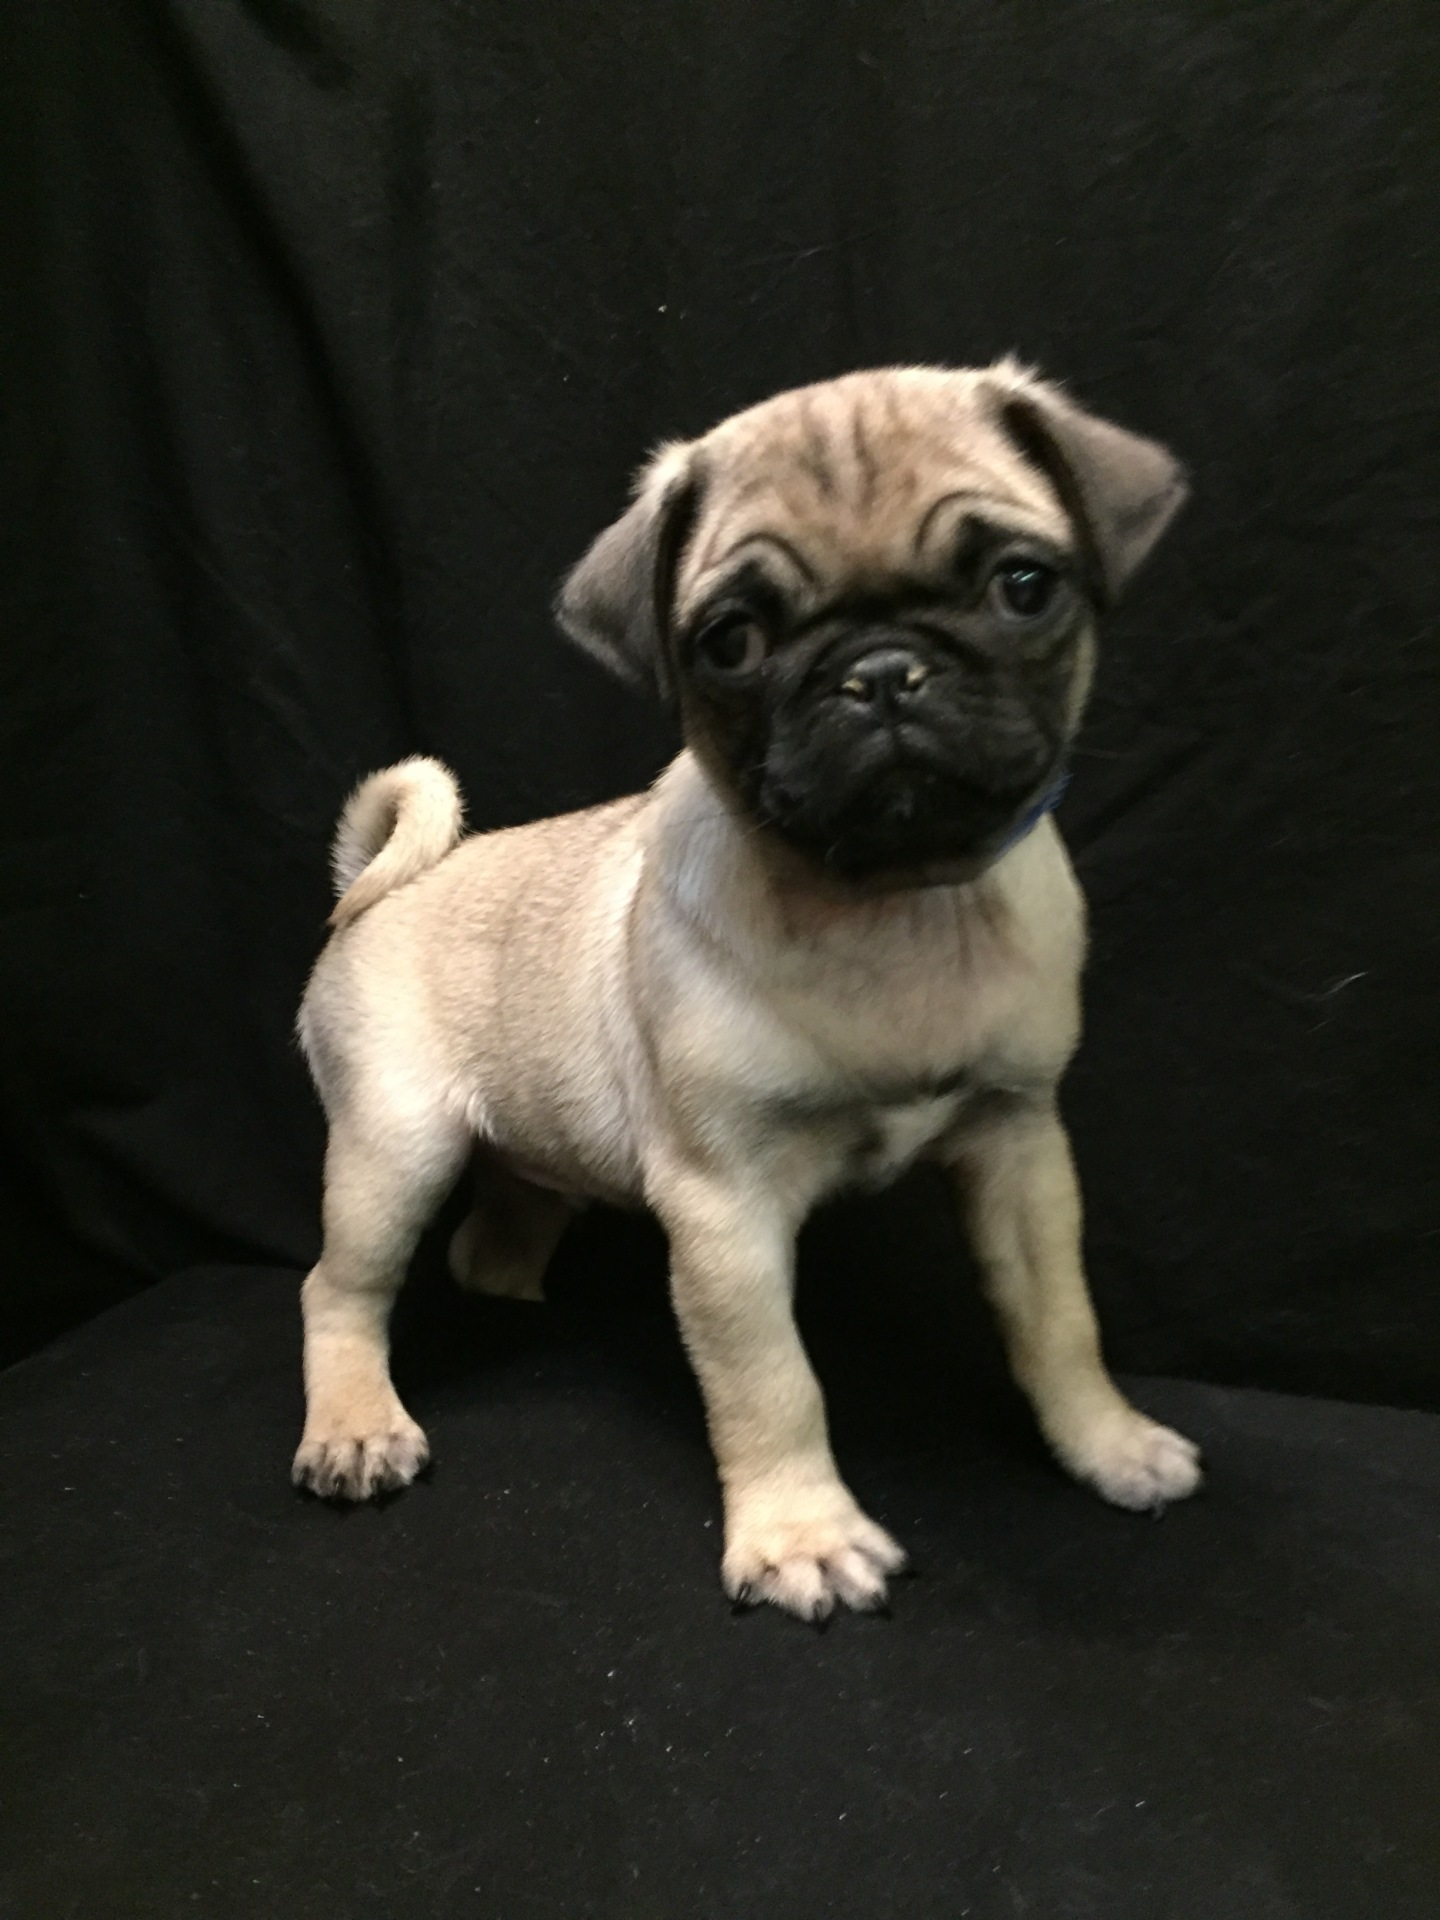 #2163 - Male Pug